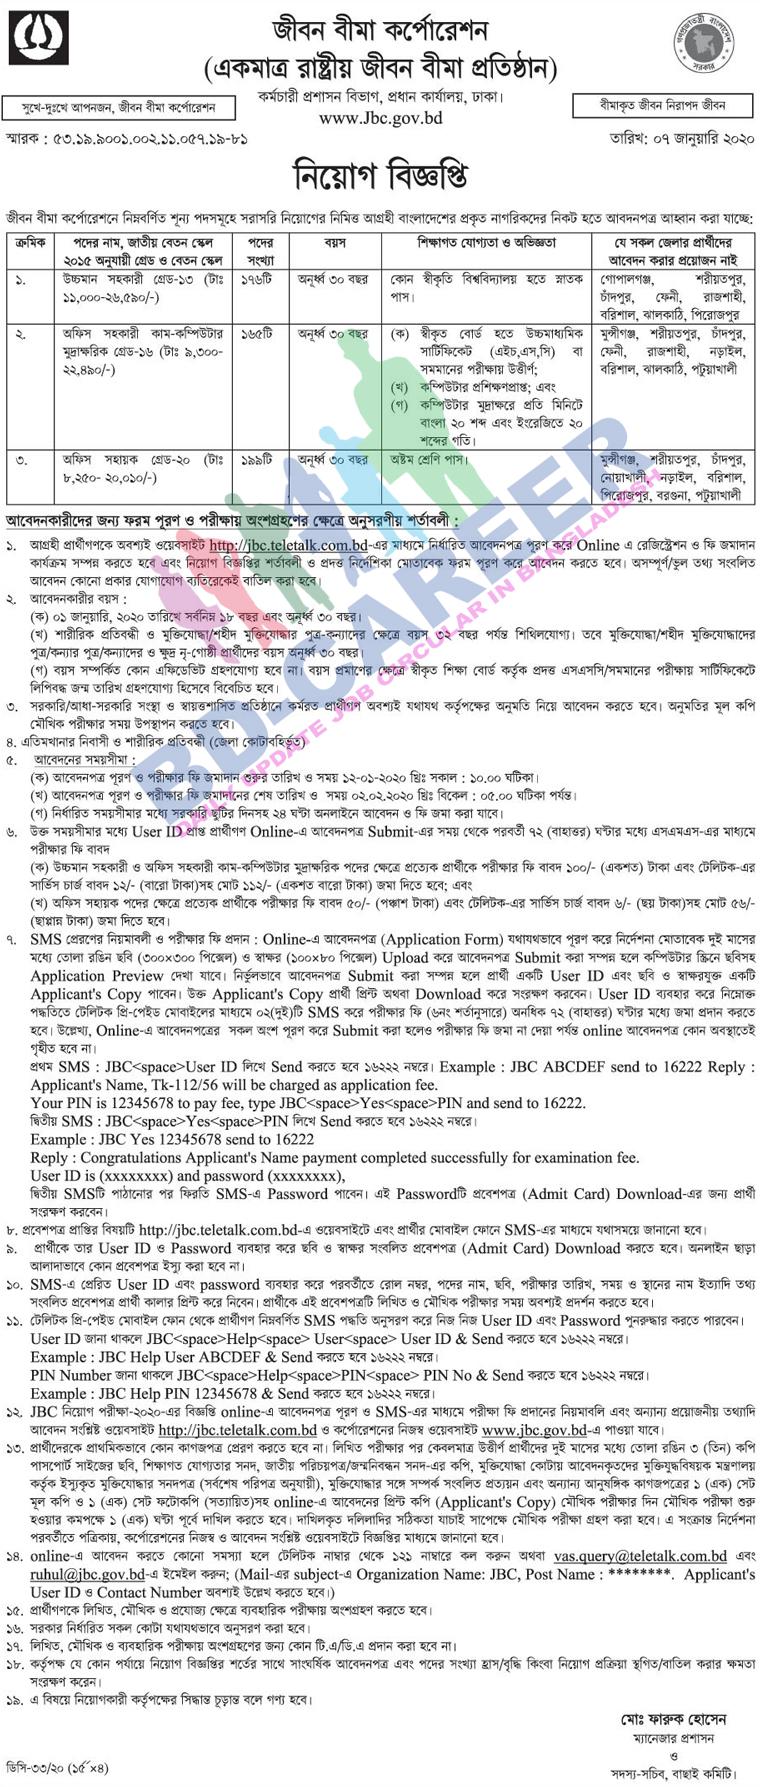 JBC Job Circular 2020 - jbc gov bd